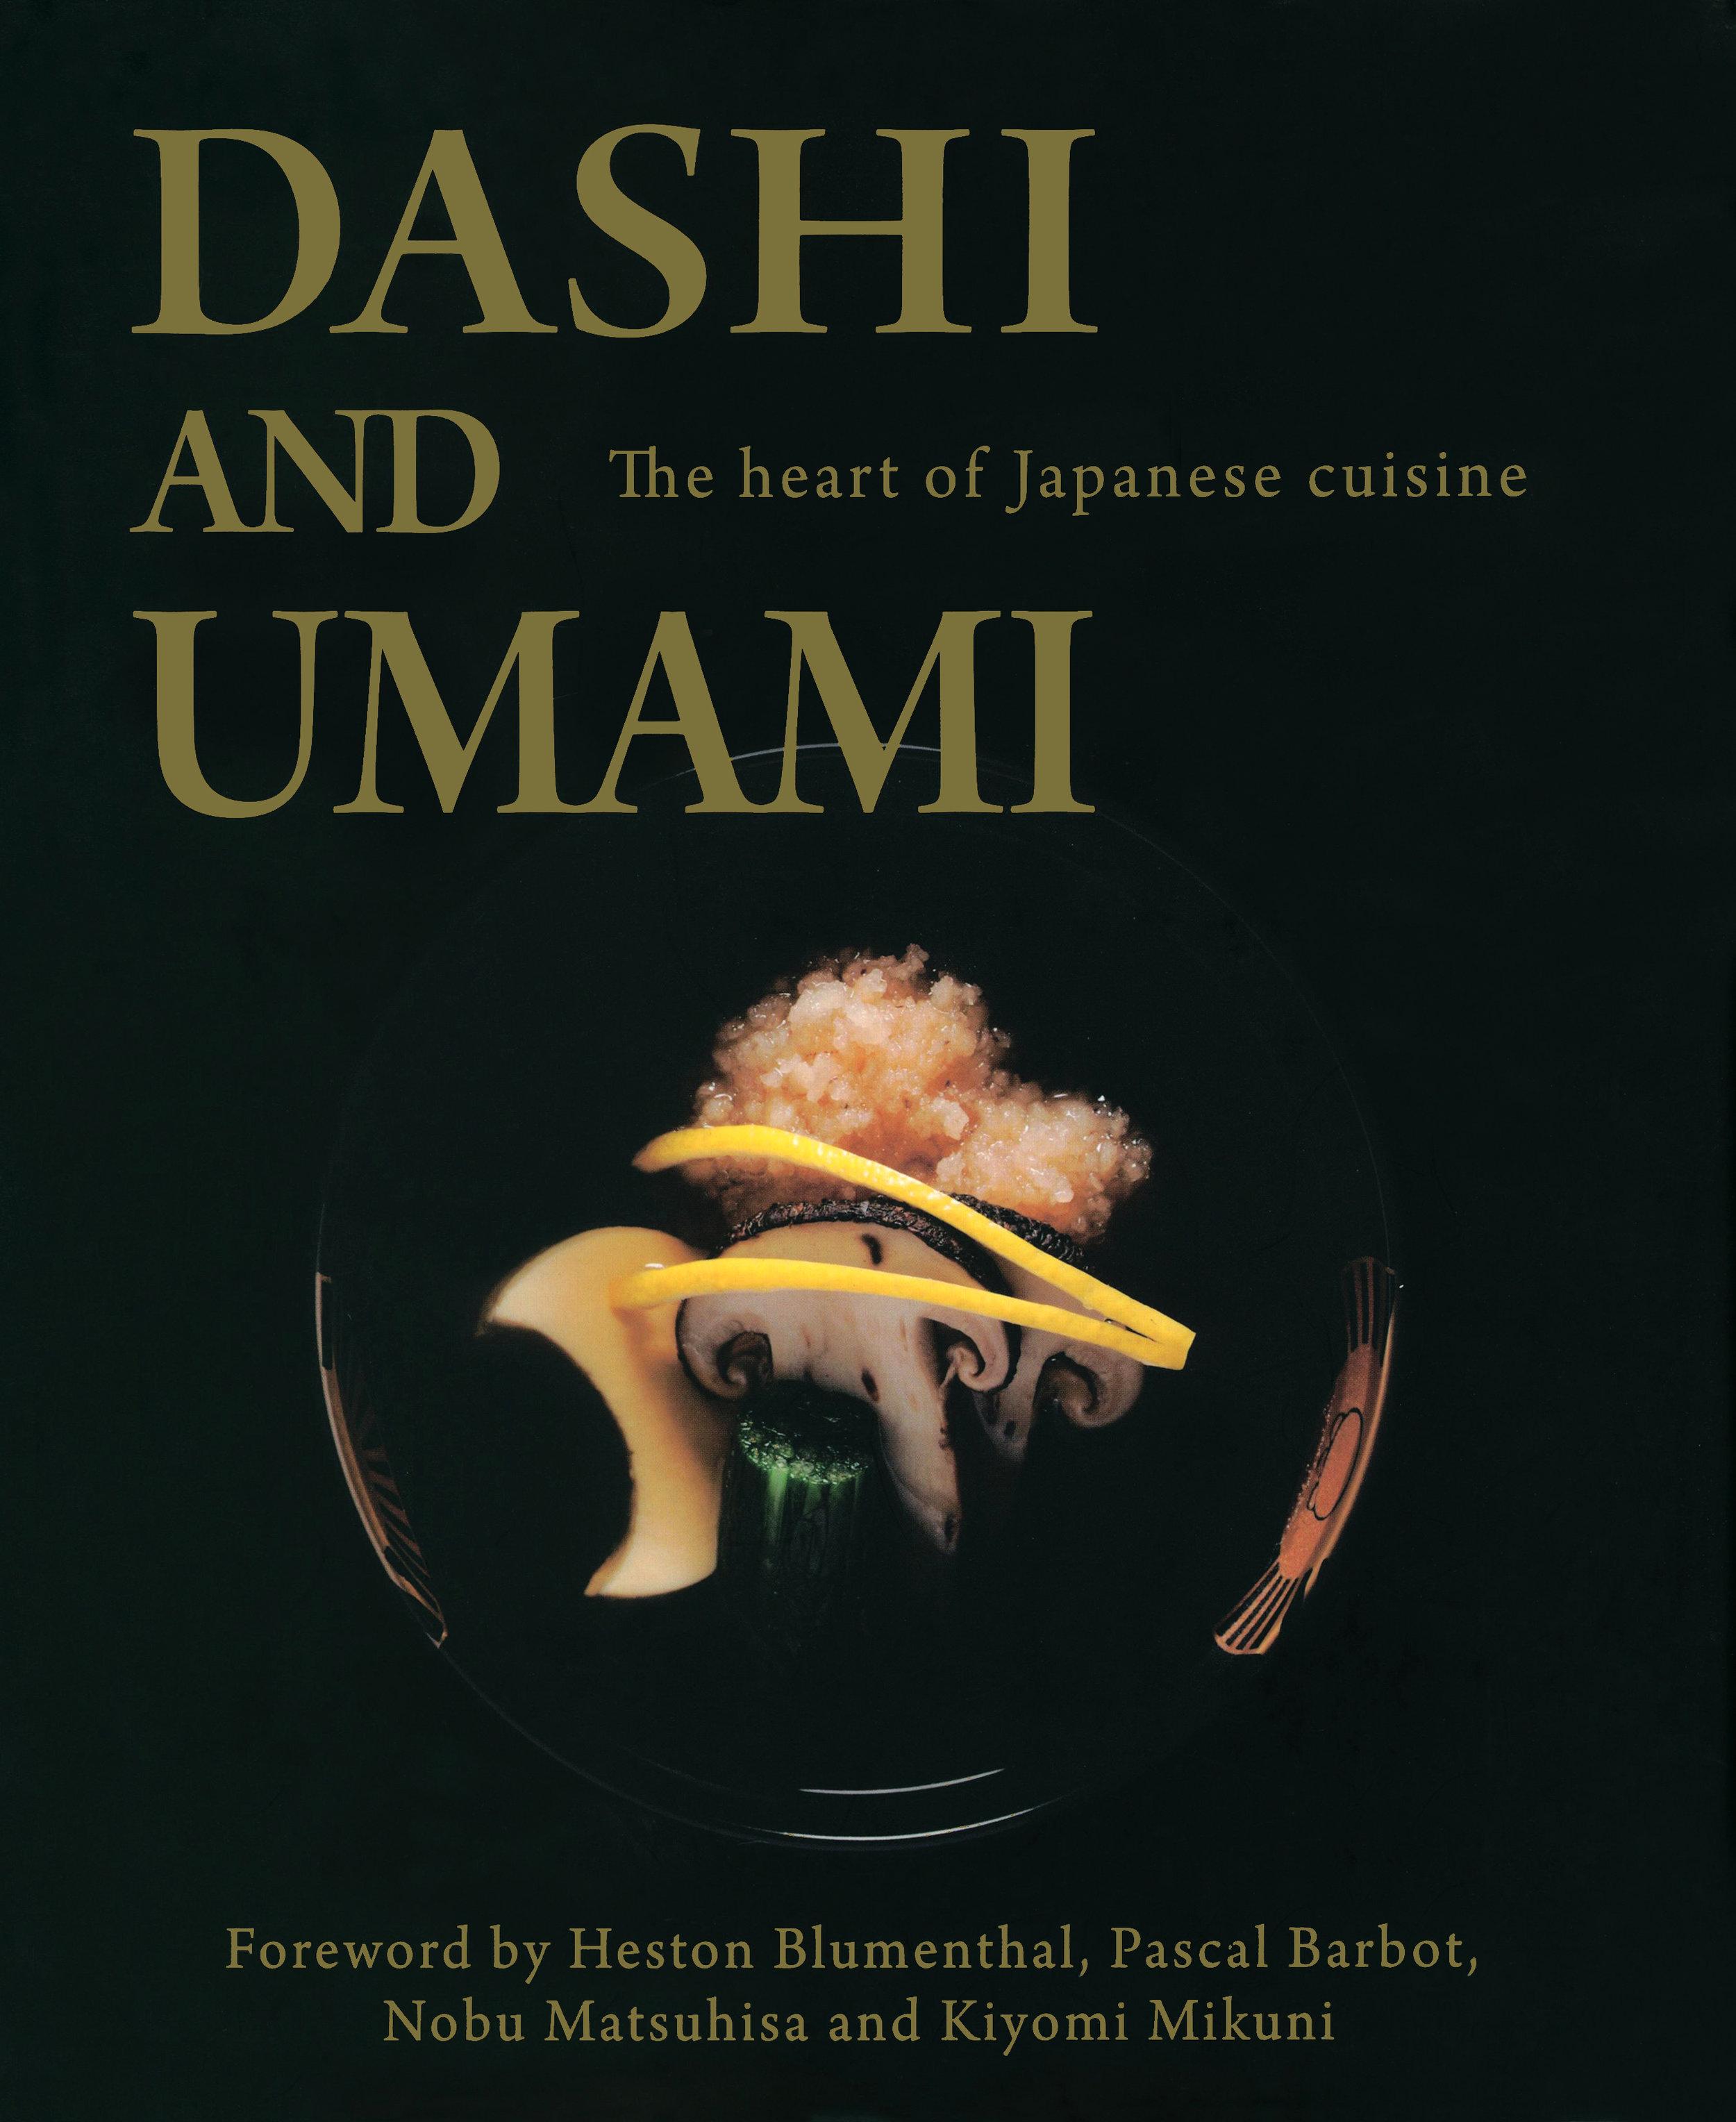 Cross Media - Dashi and Umami The Heart of Japanese cuisine - 9781897701935.jpg